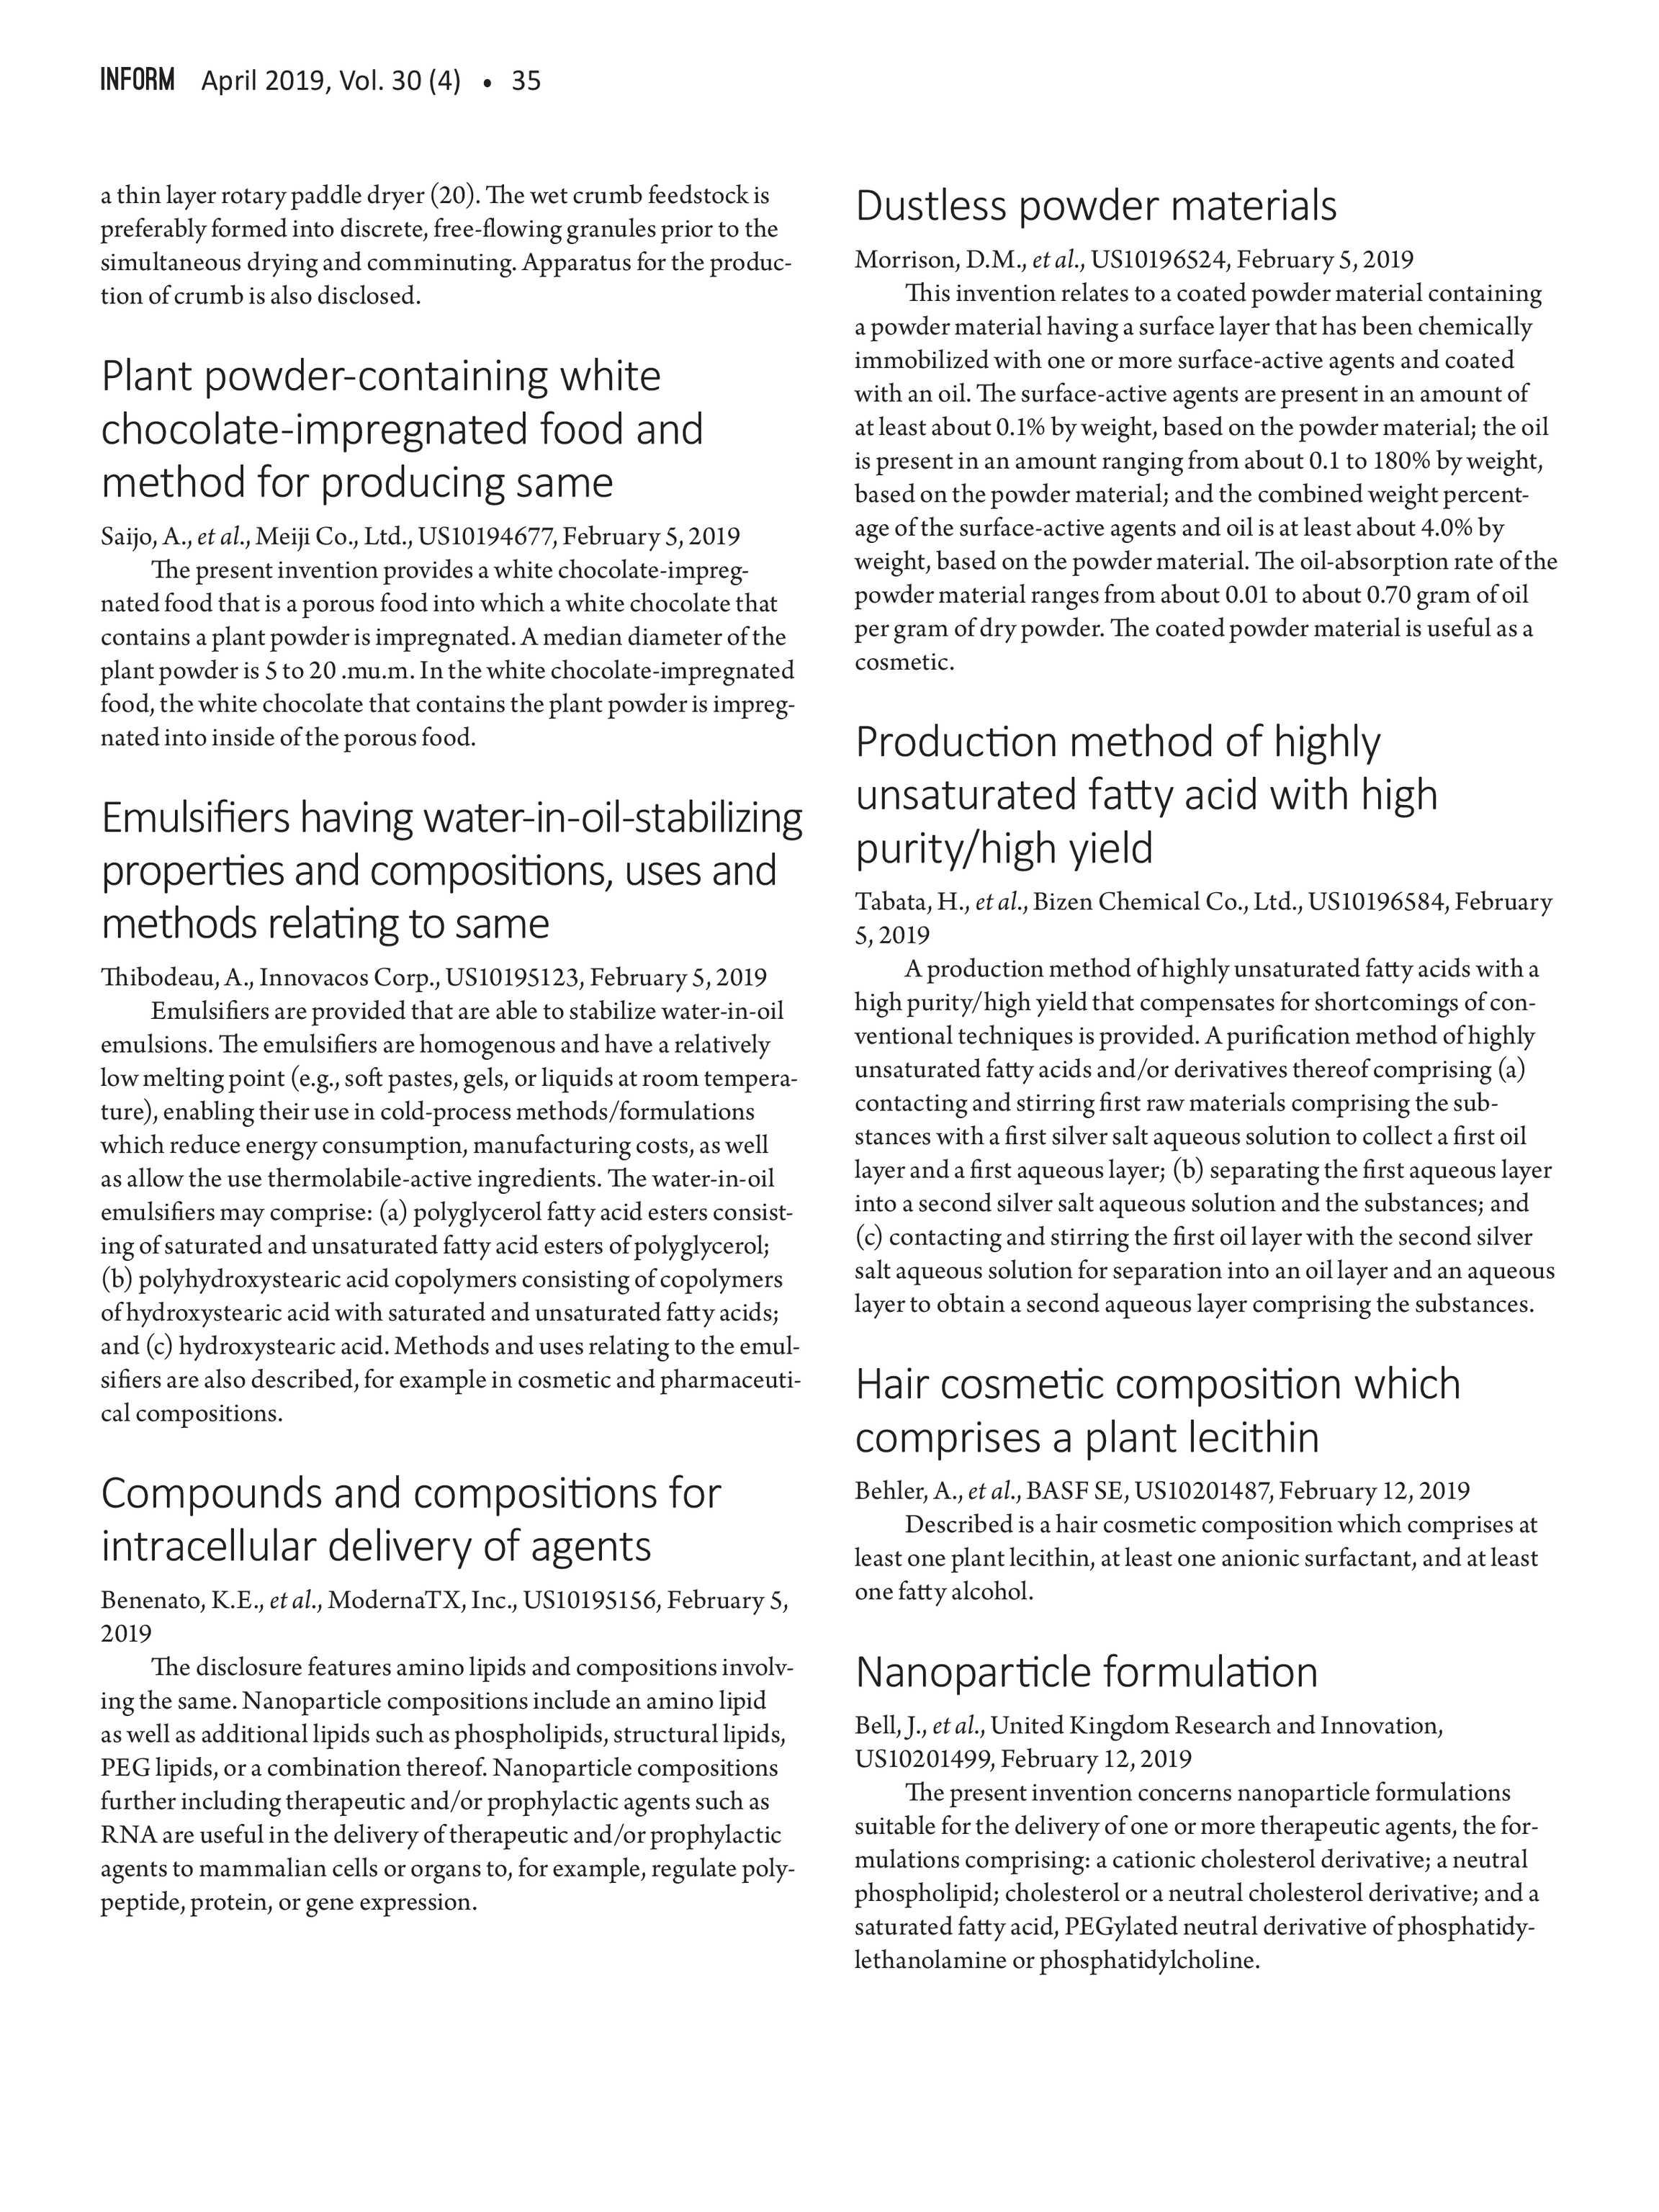 Inform Magazine - April 2019 - page 34